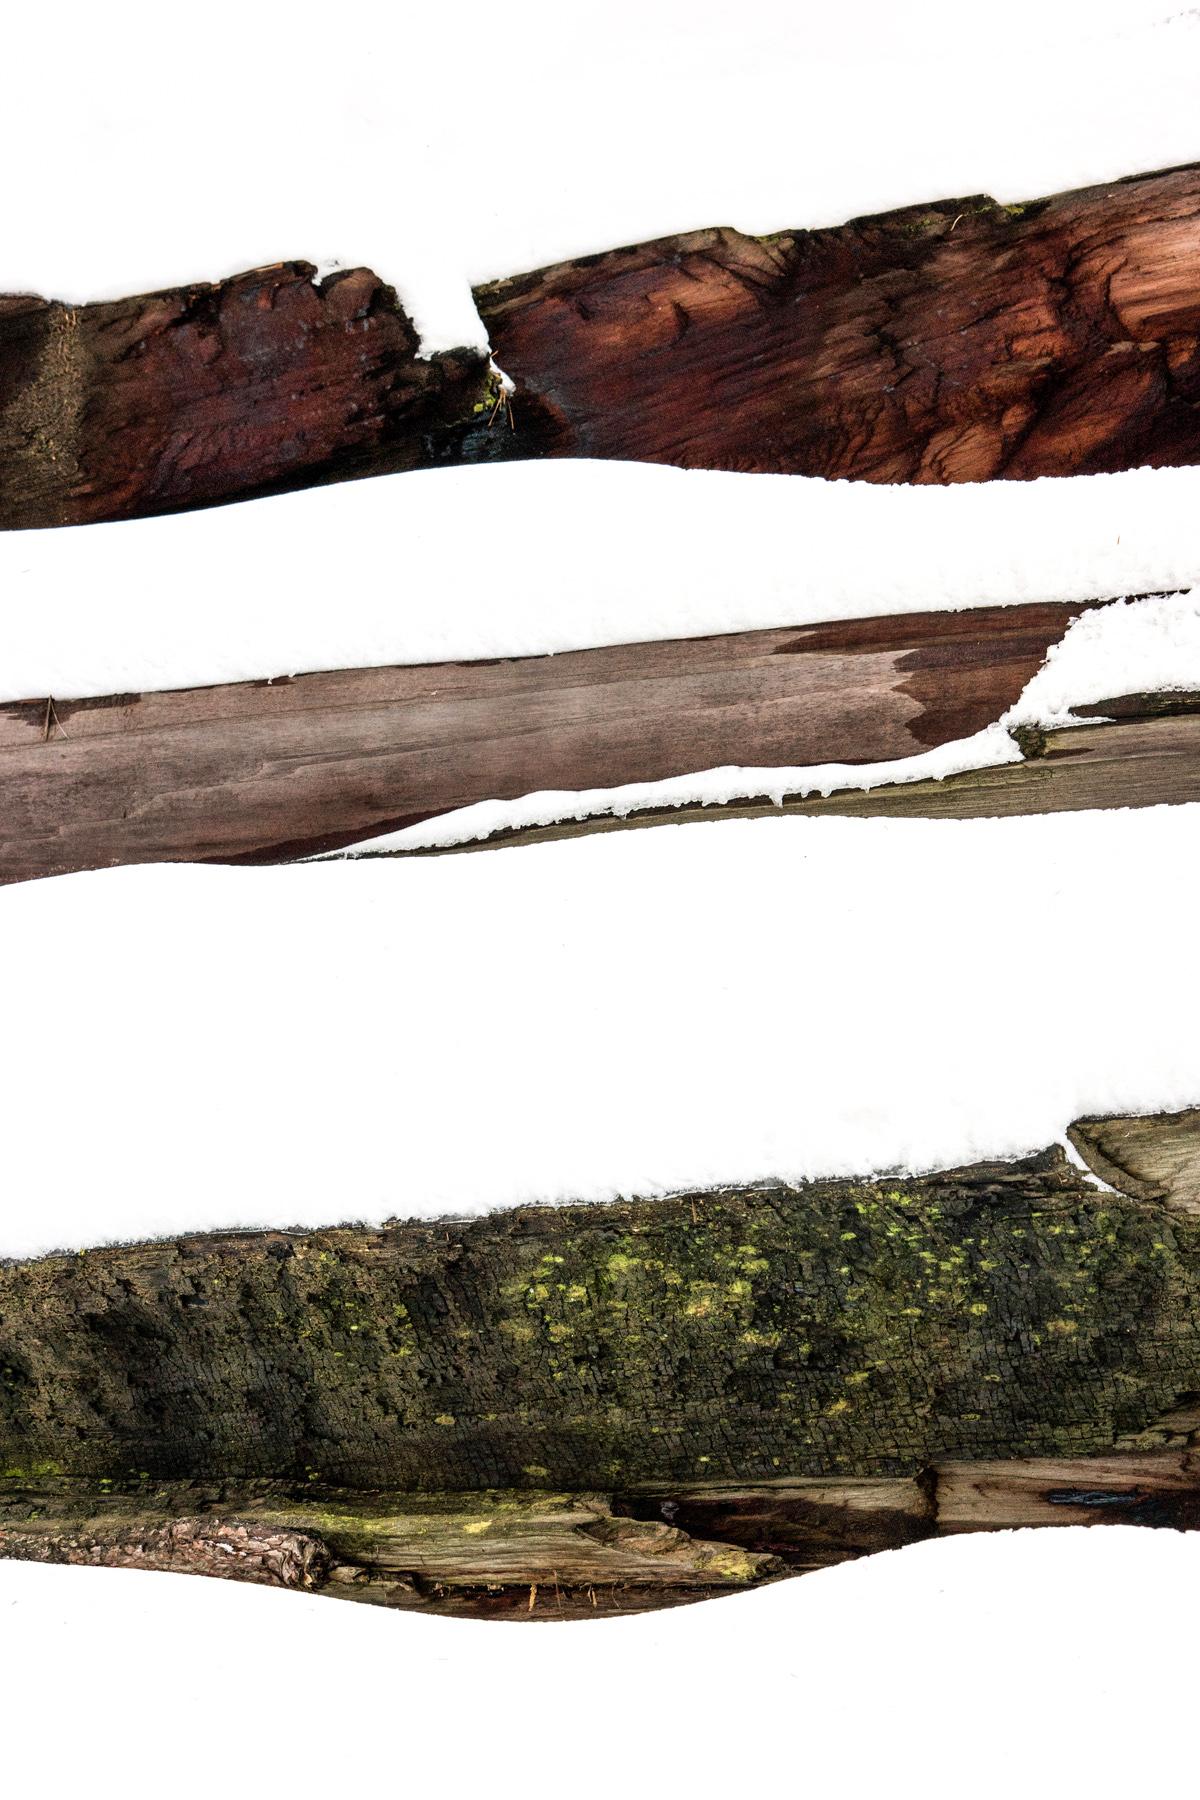 Wasim Muklashy Photography_Sequoia National Park_California_December 2015_-SAM_4116-Edit.jpg